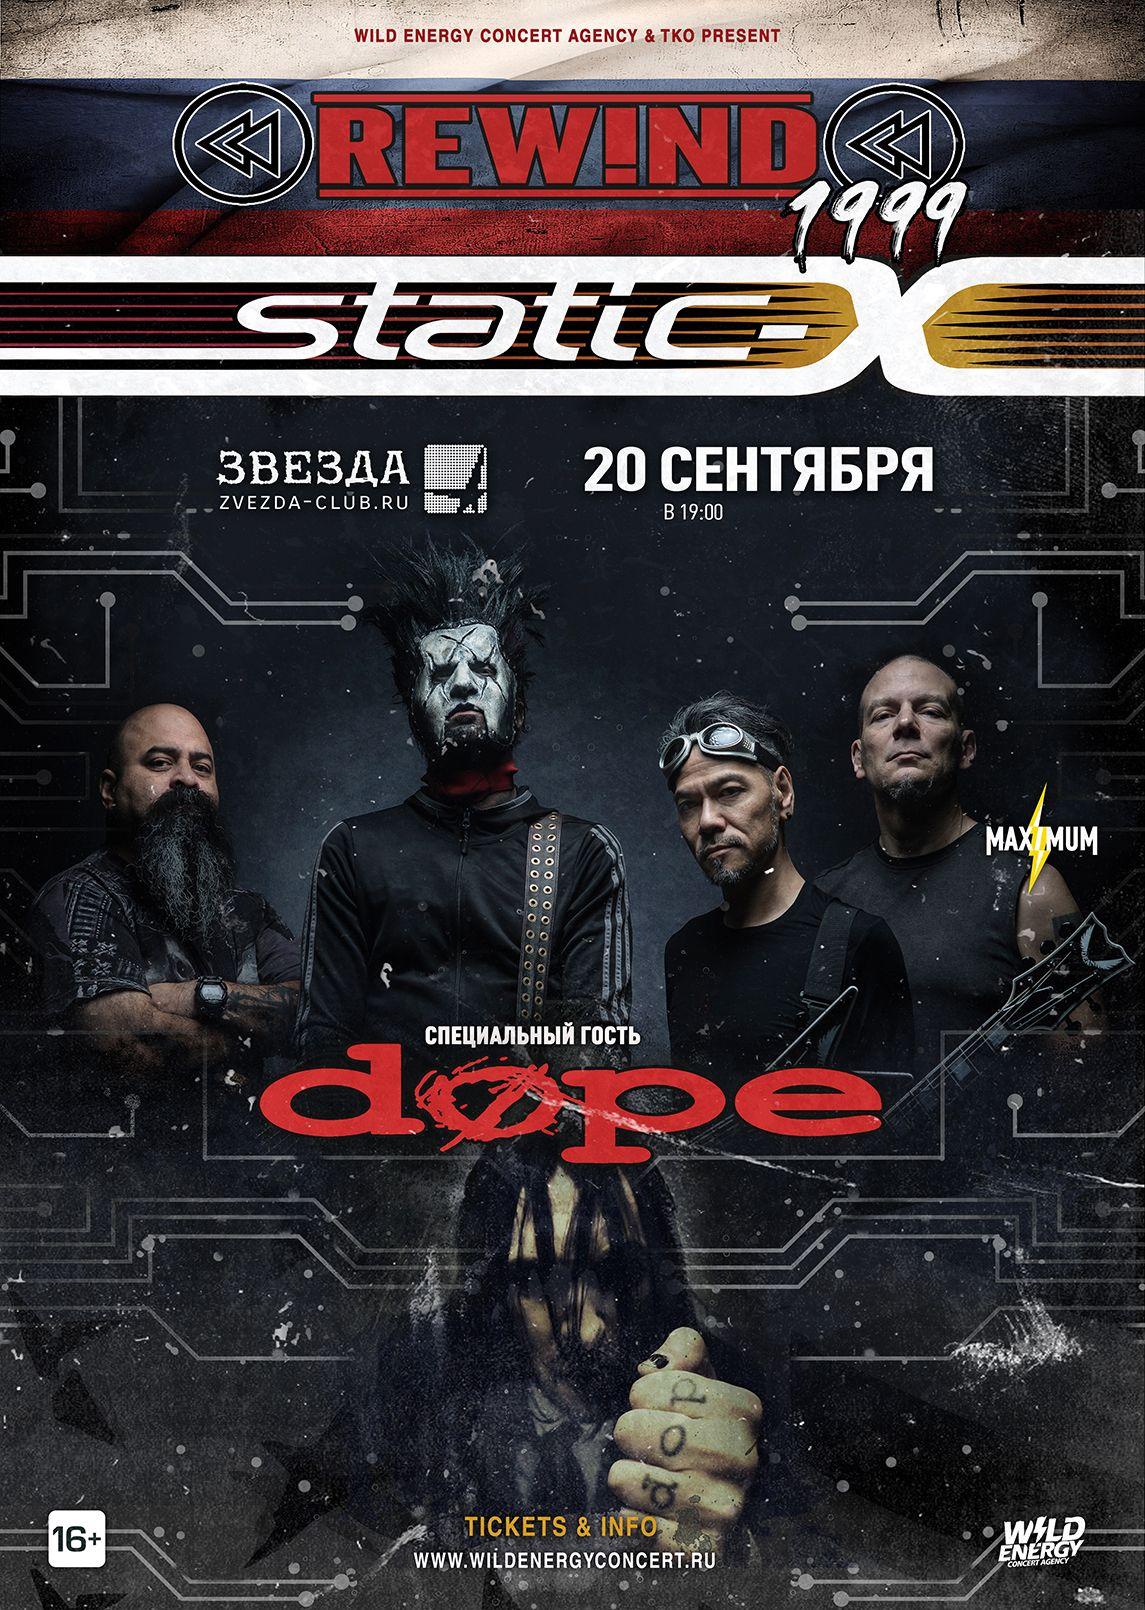 STATIC-X + DOPE